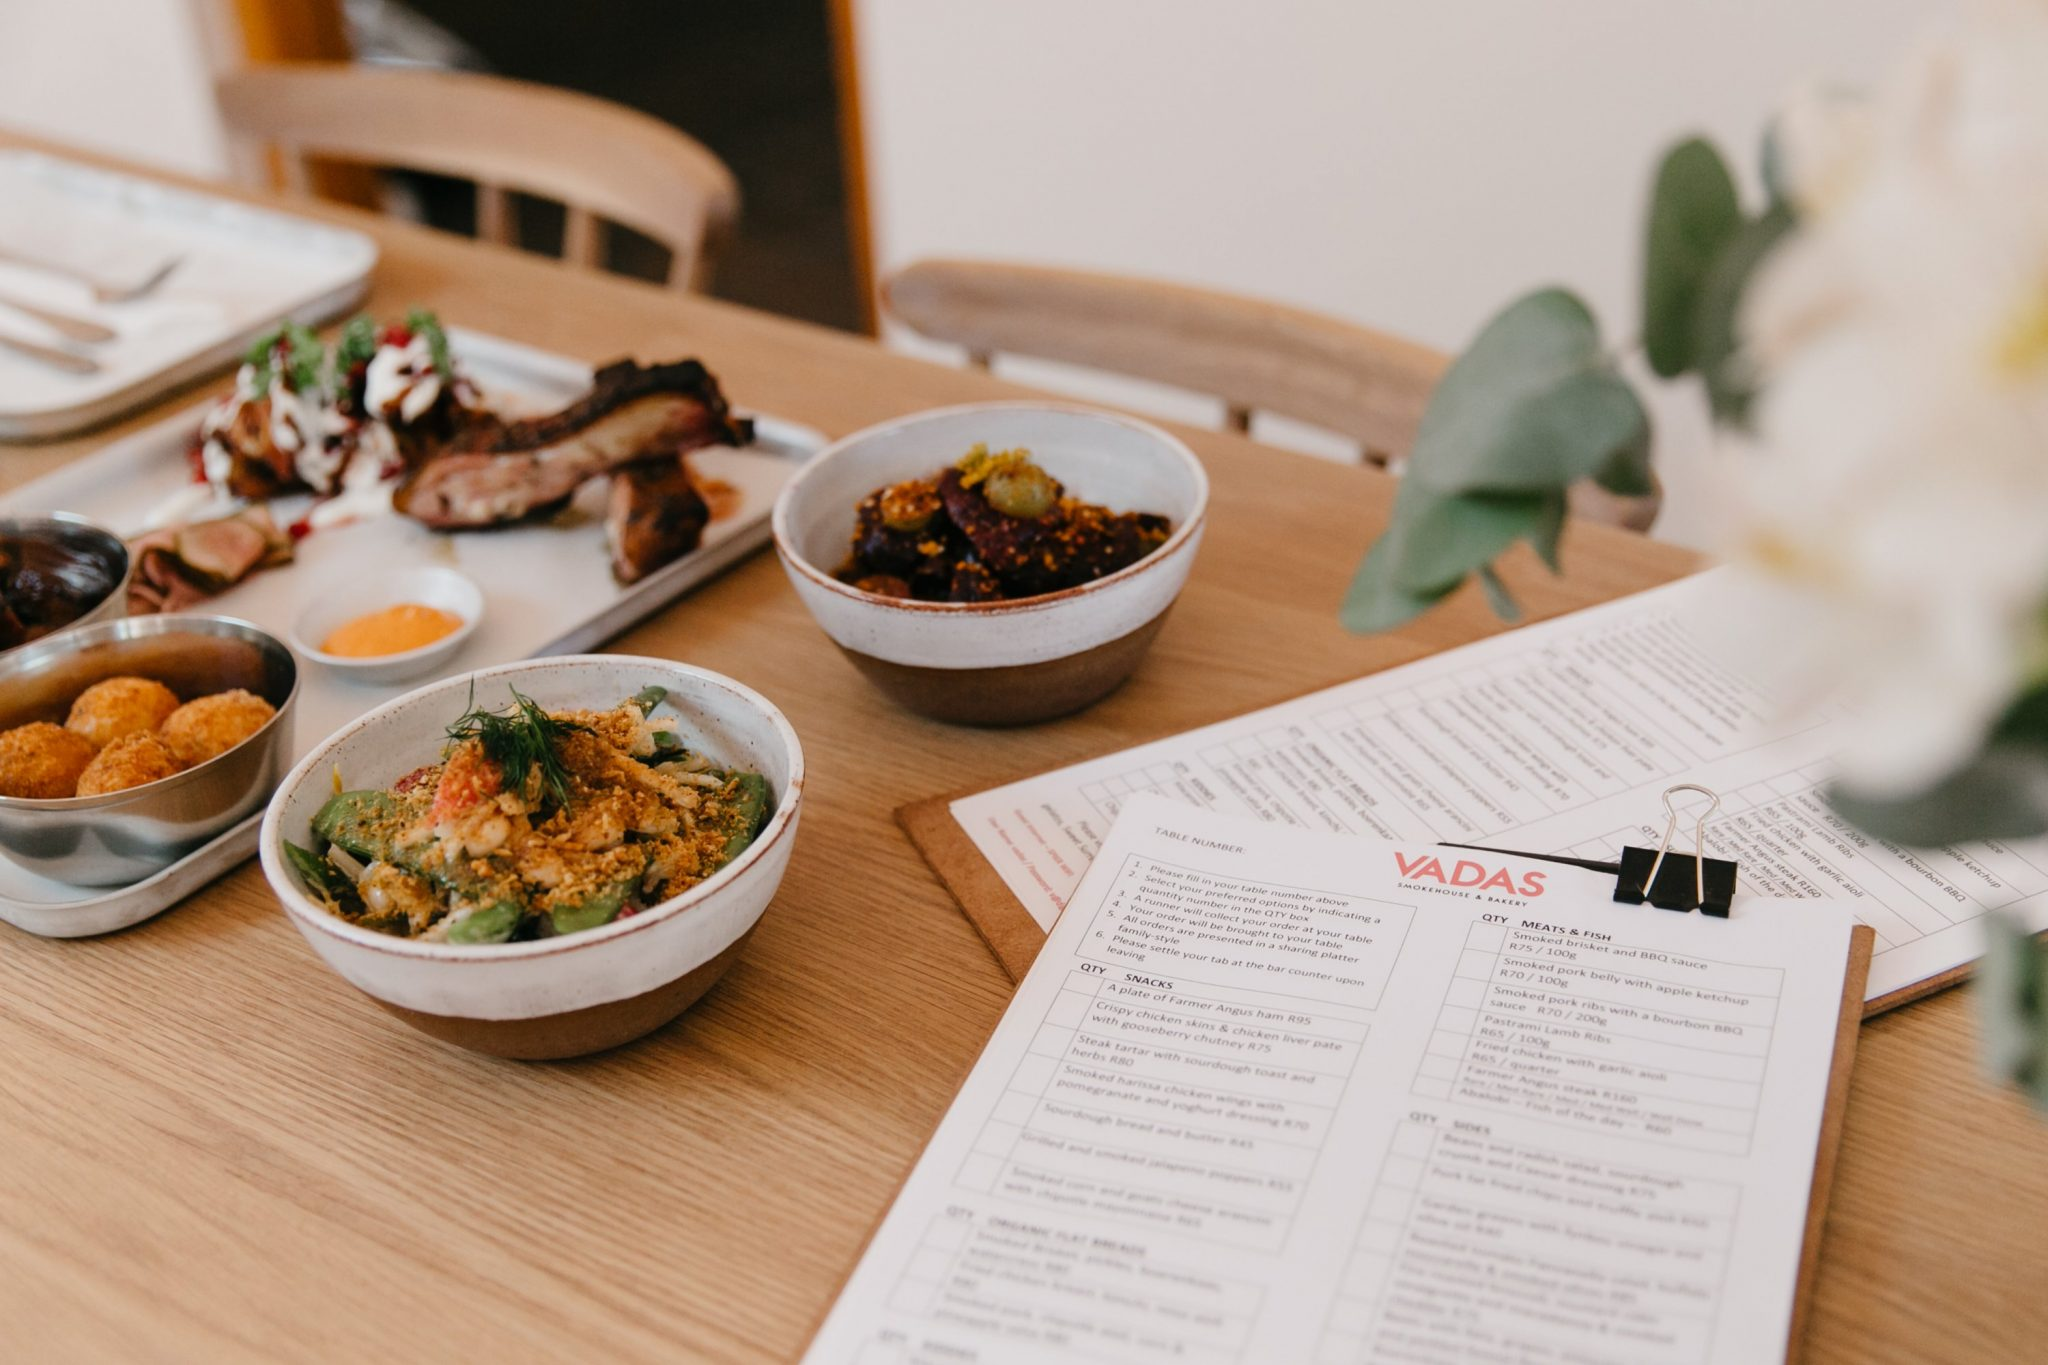 Vadas winter menu special sonia cabano blog eatdrinkcapetown